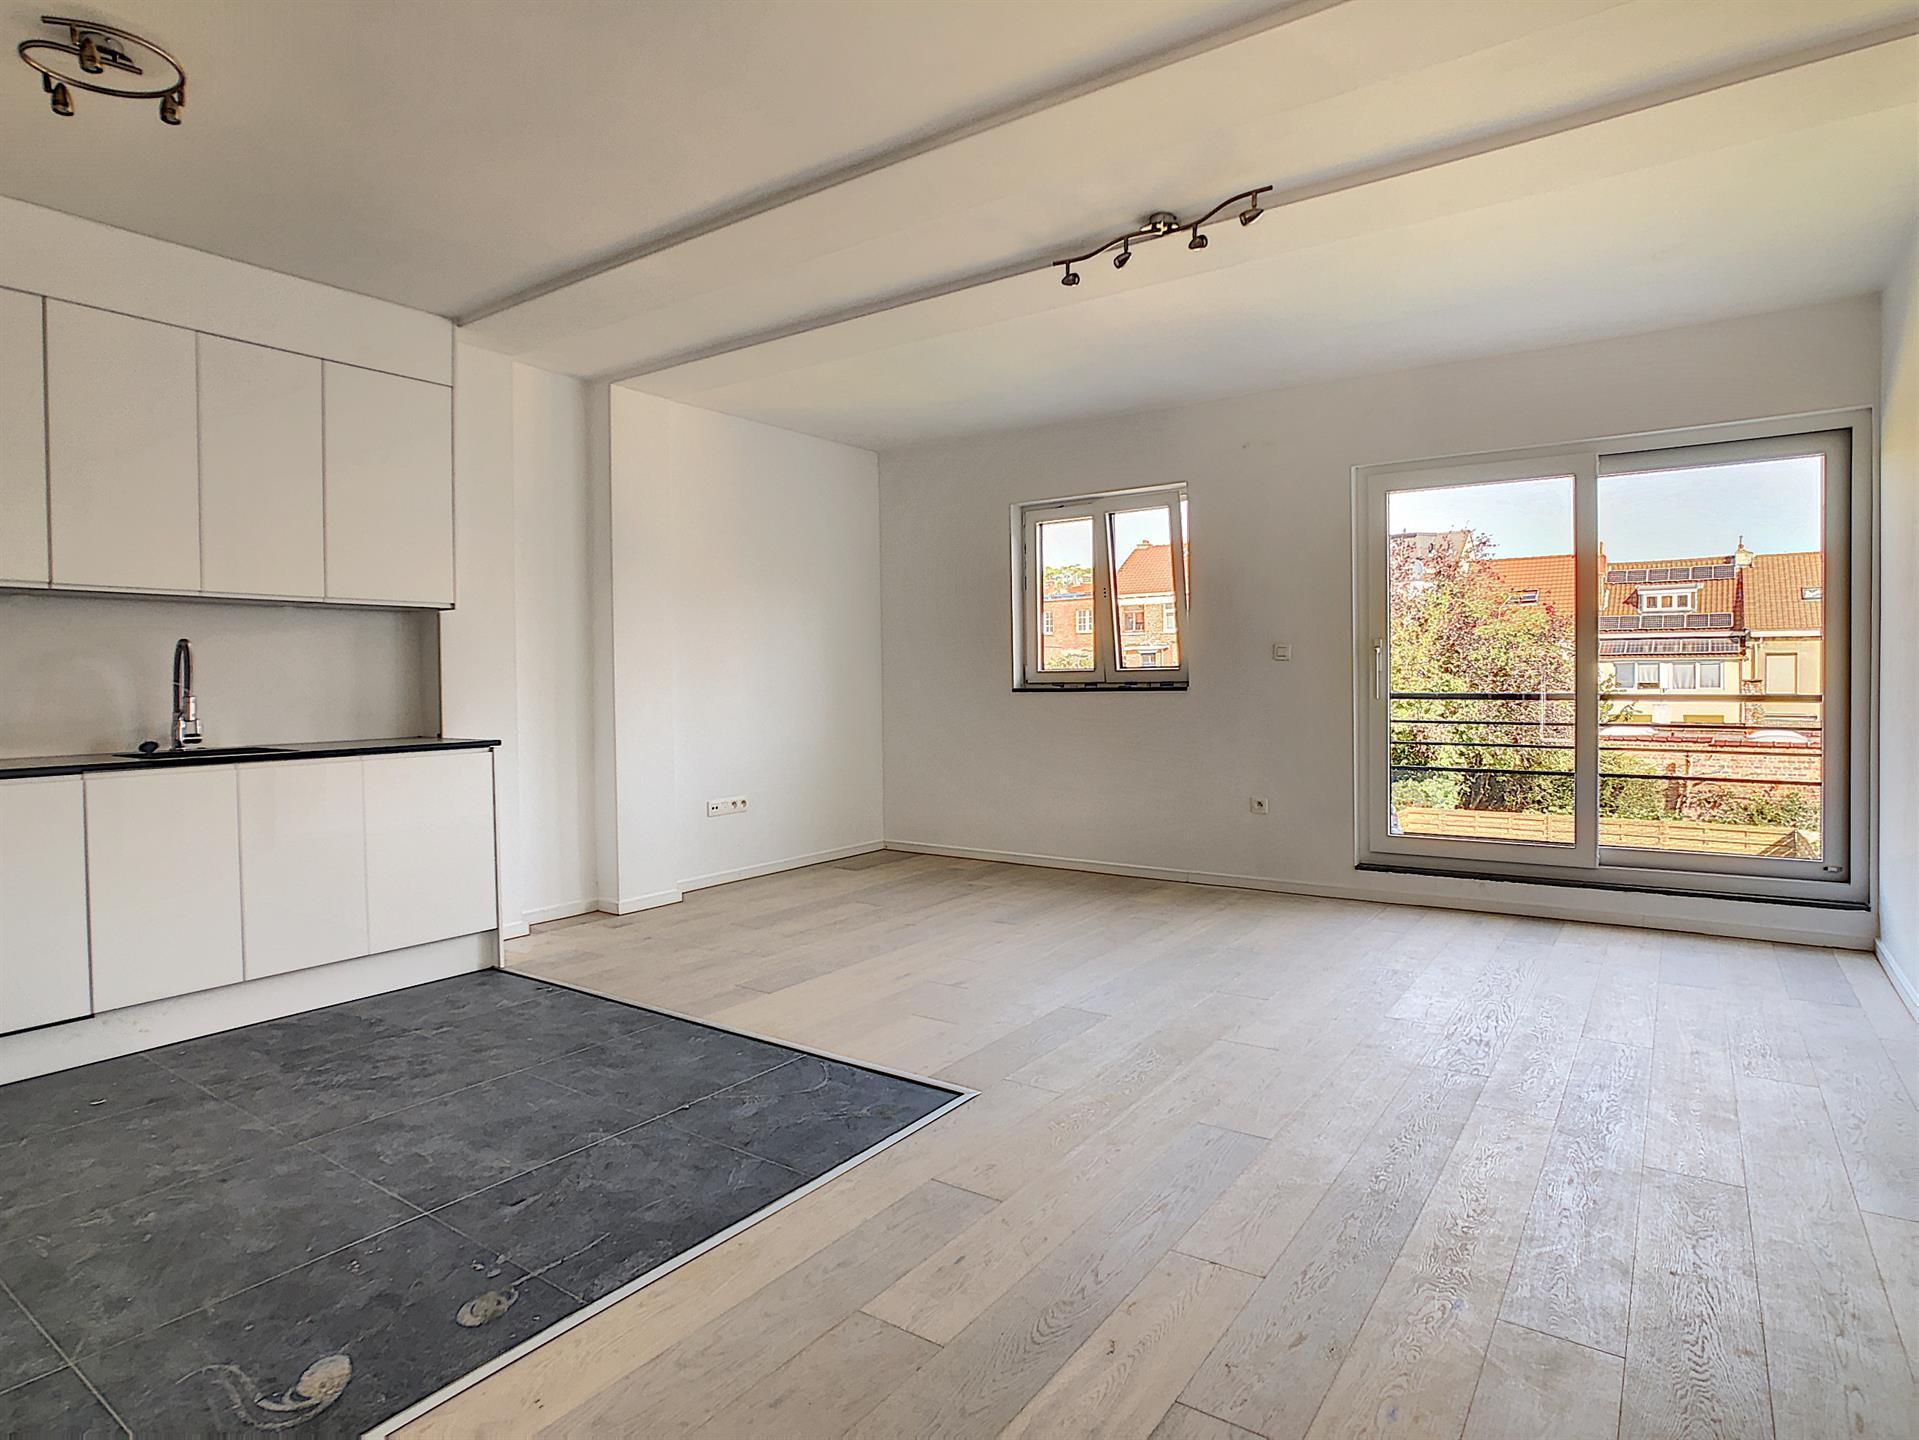 Appartement - Anderlecht - #4252385-13